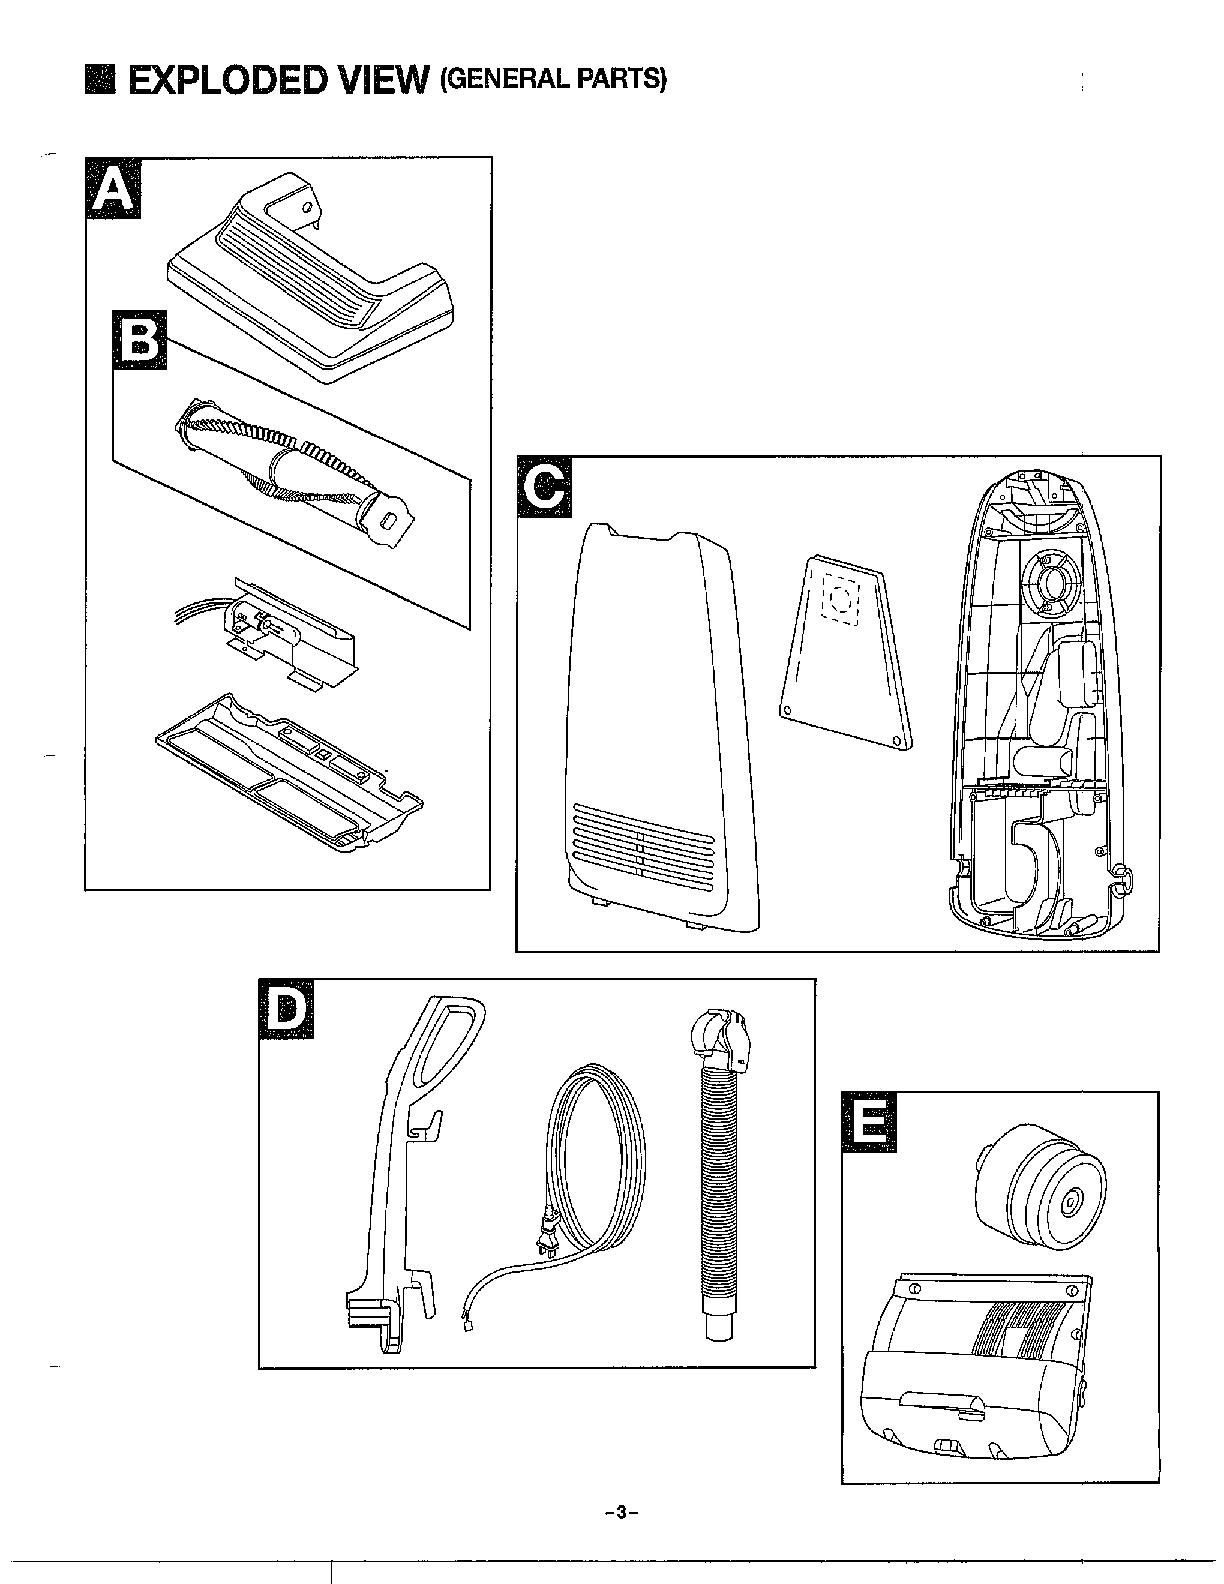 Panasonic model MC-6815 vacuum, upright genuine parts